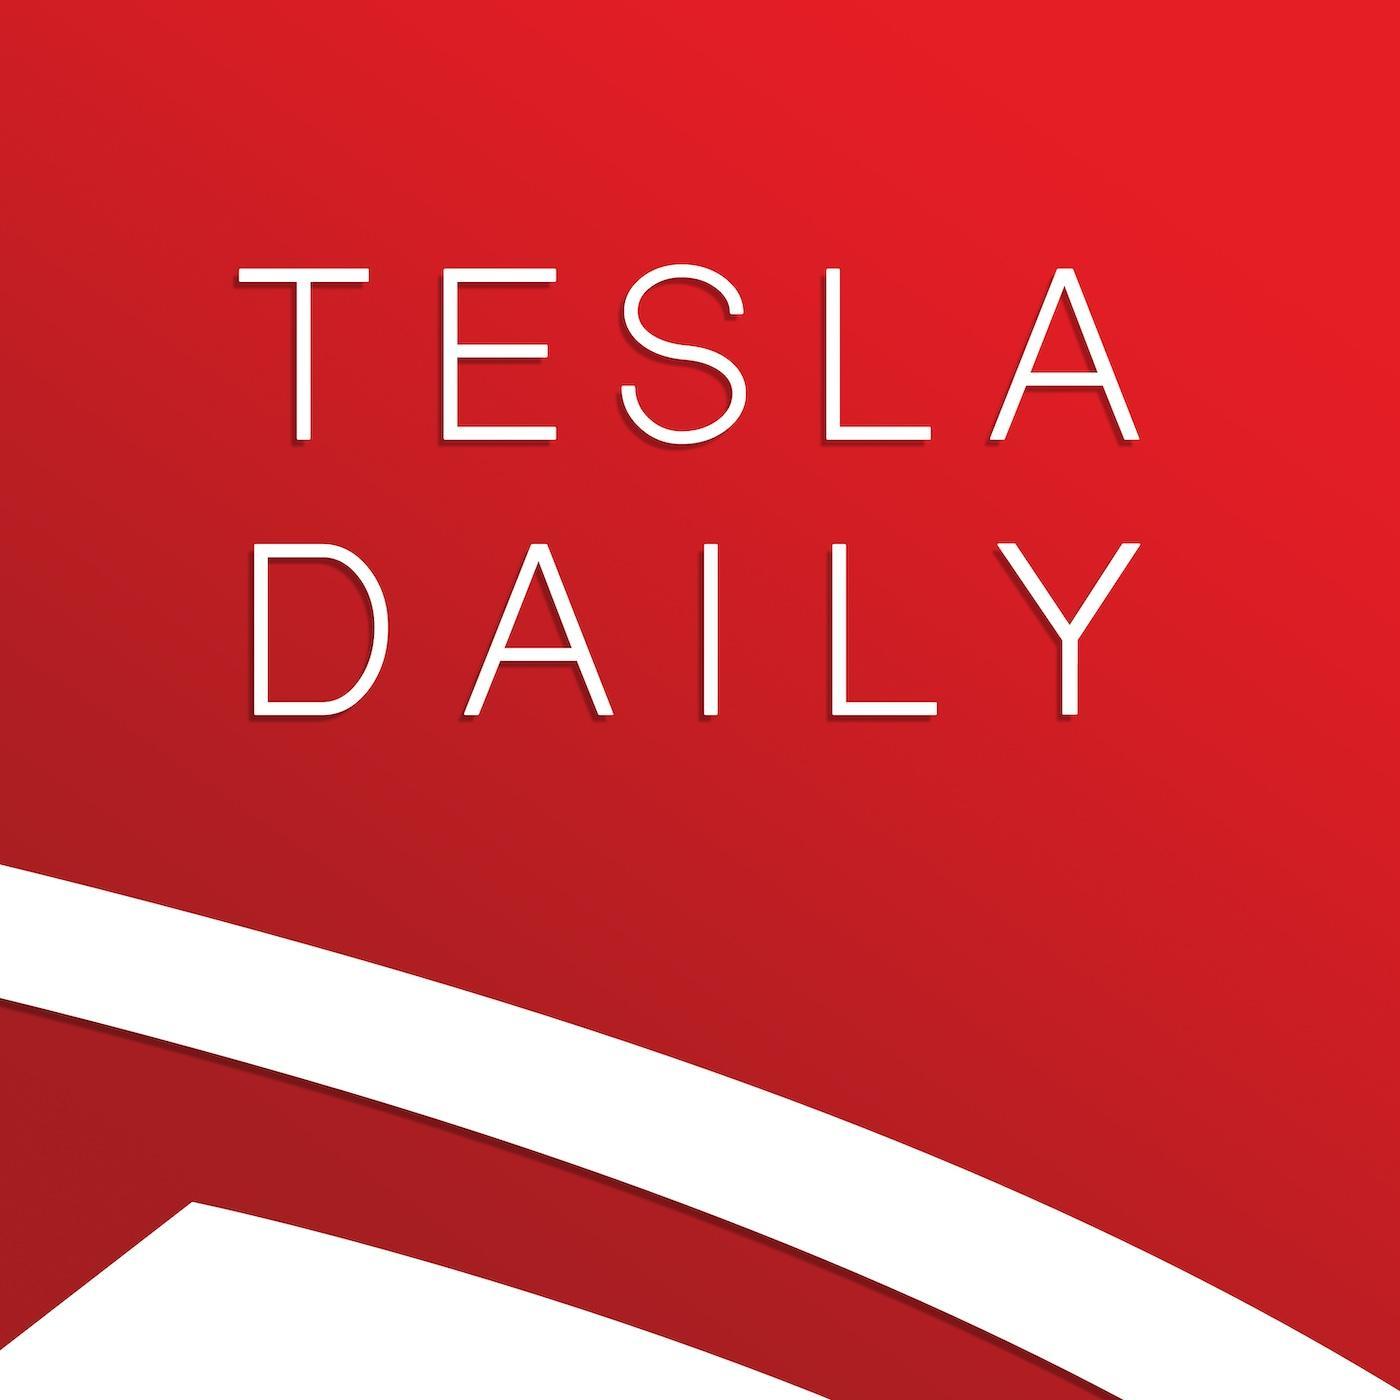 Solar Update, JPMorgan Price Target, New Early Access Feature, BMW/Daimler (06.19.20)